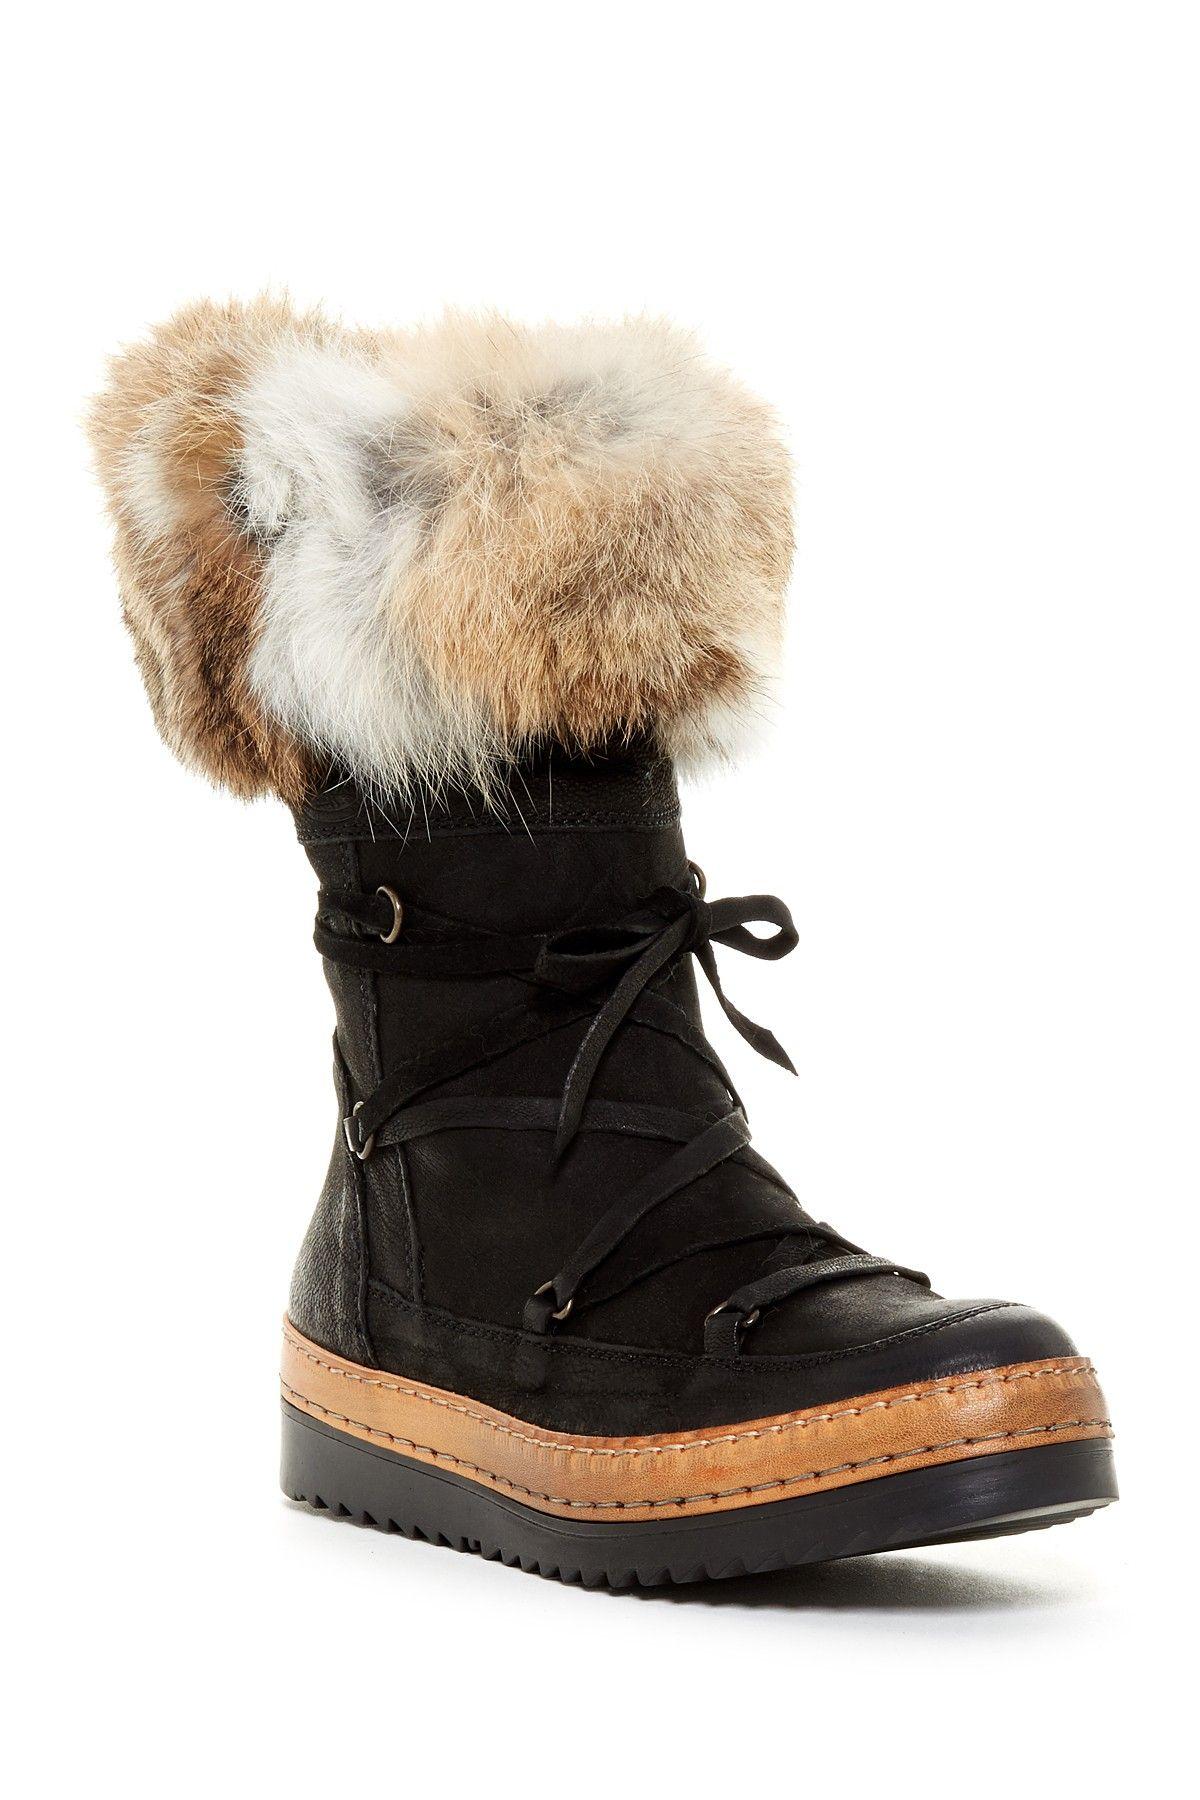 Olli Genuine Ram Fur Cuff Boot by Manas on @HauteLook